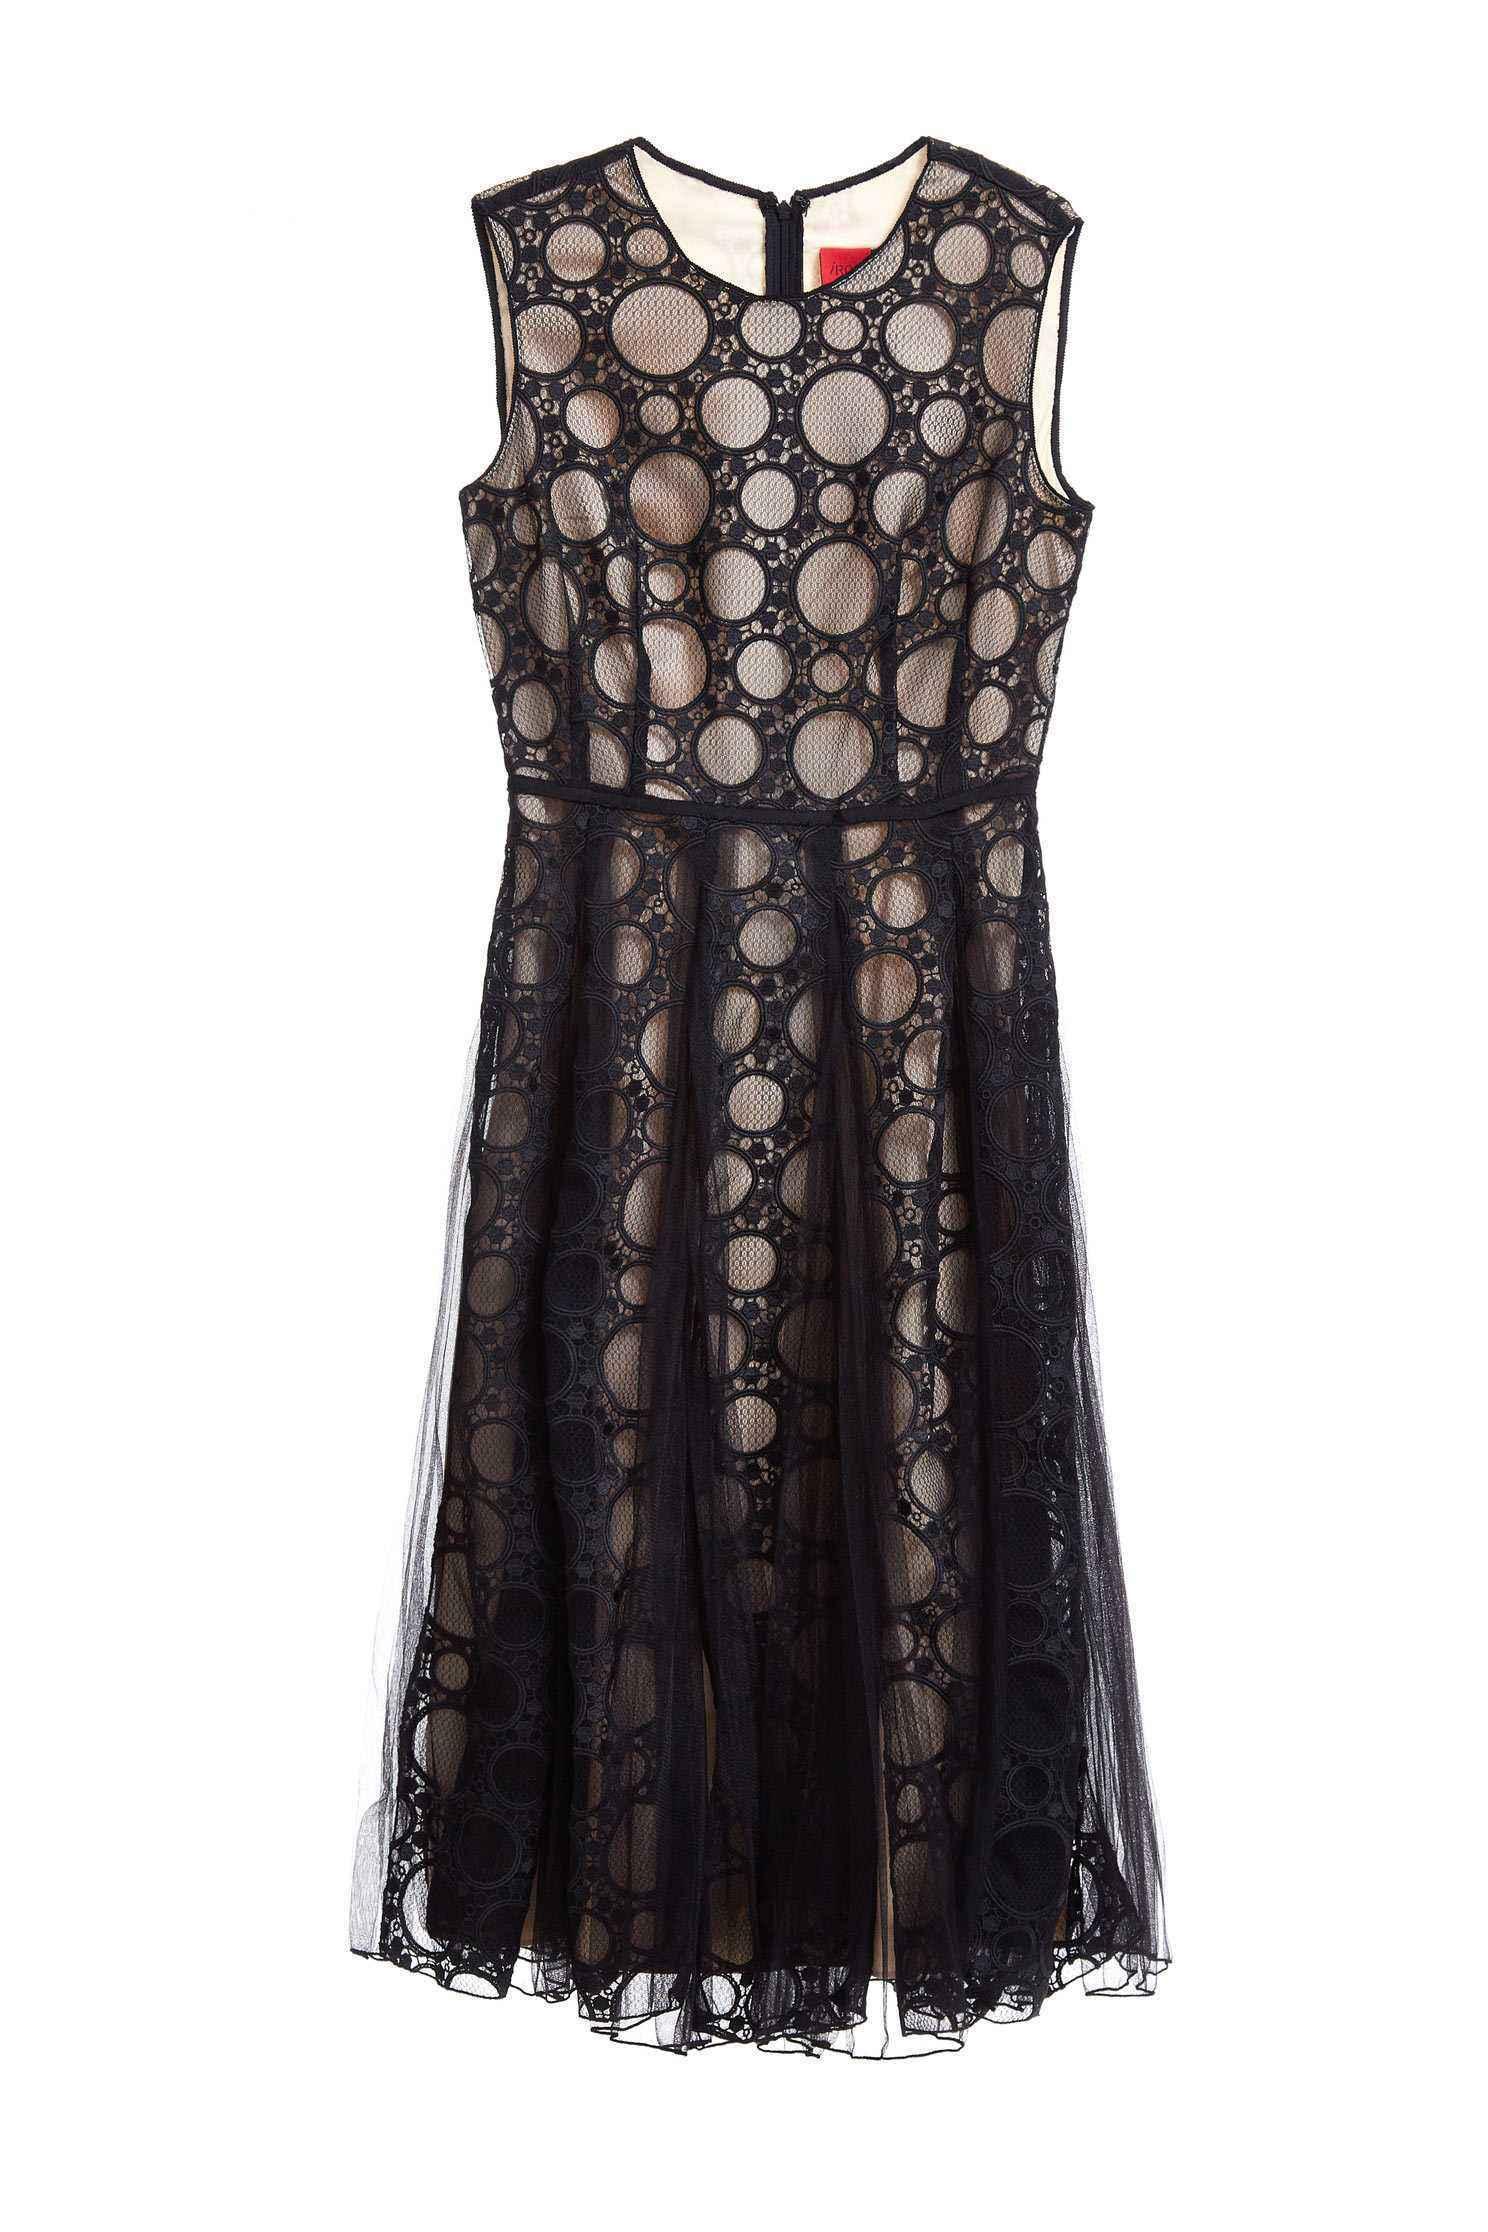 Elegance and gorgeous designed dress,cocktaildress,sleevelessdress,lace,lacedress